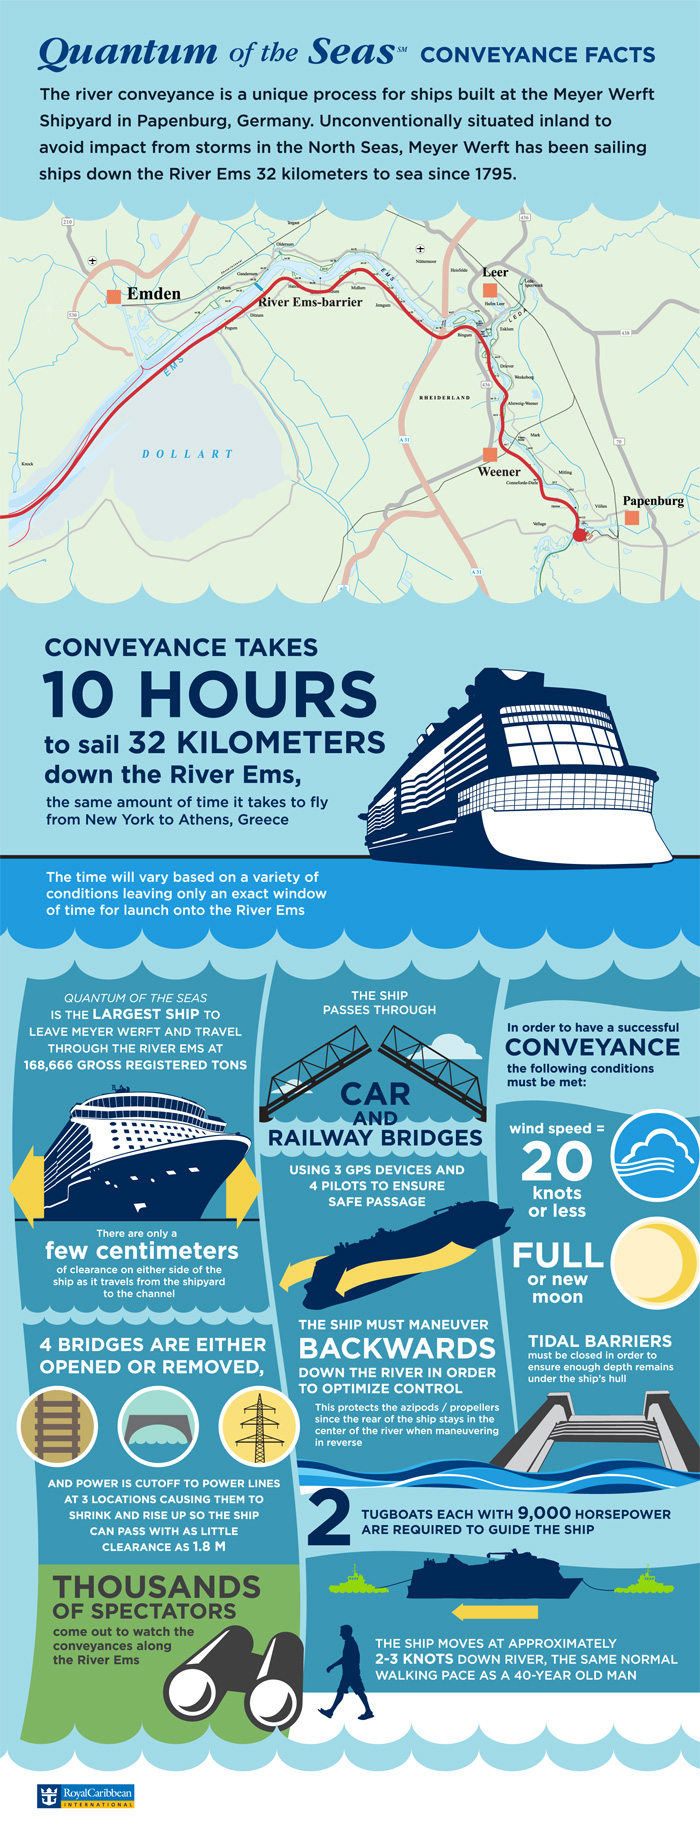 Quantum of the Seas - Conveyance